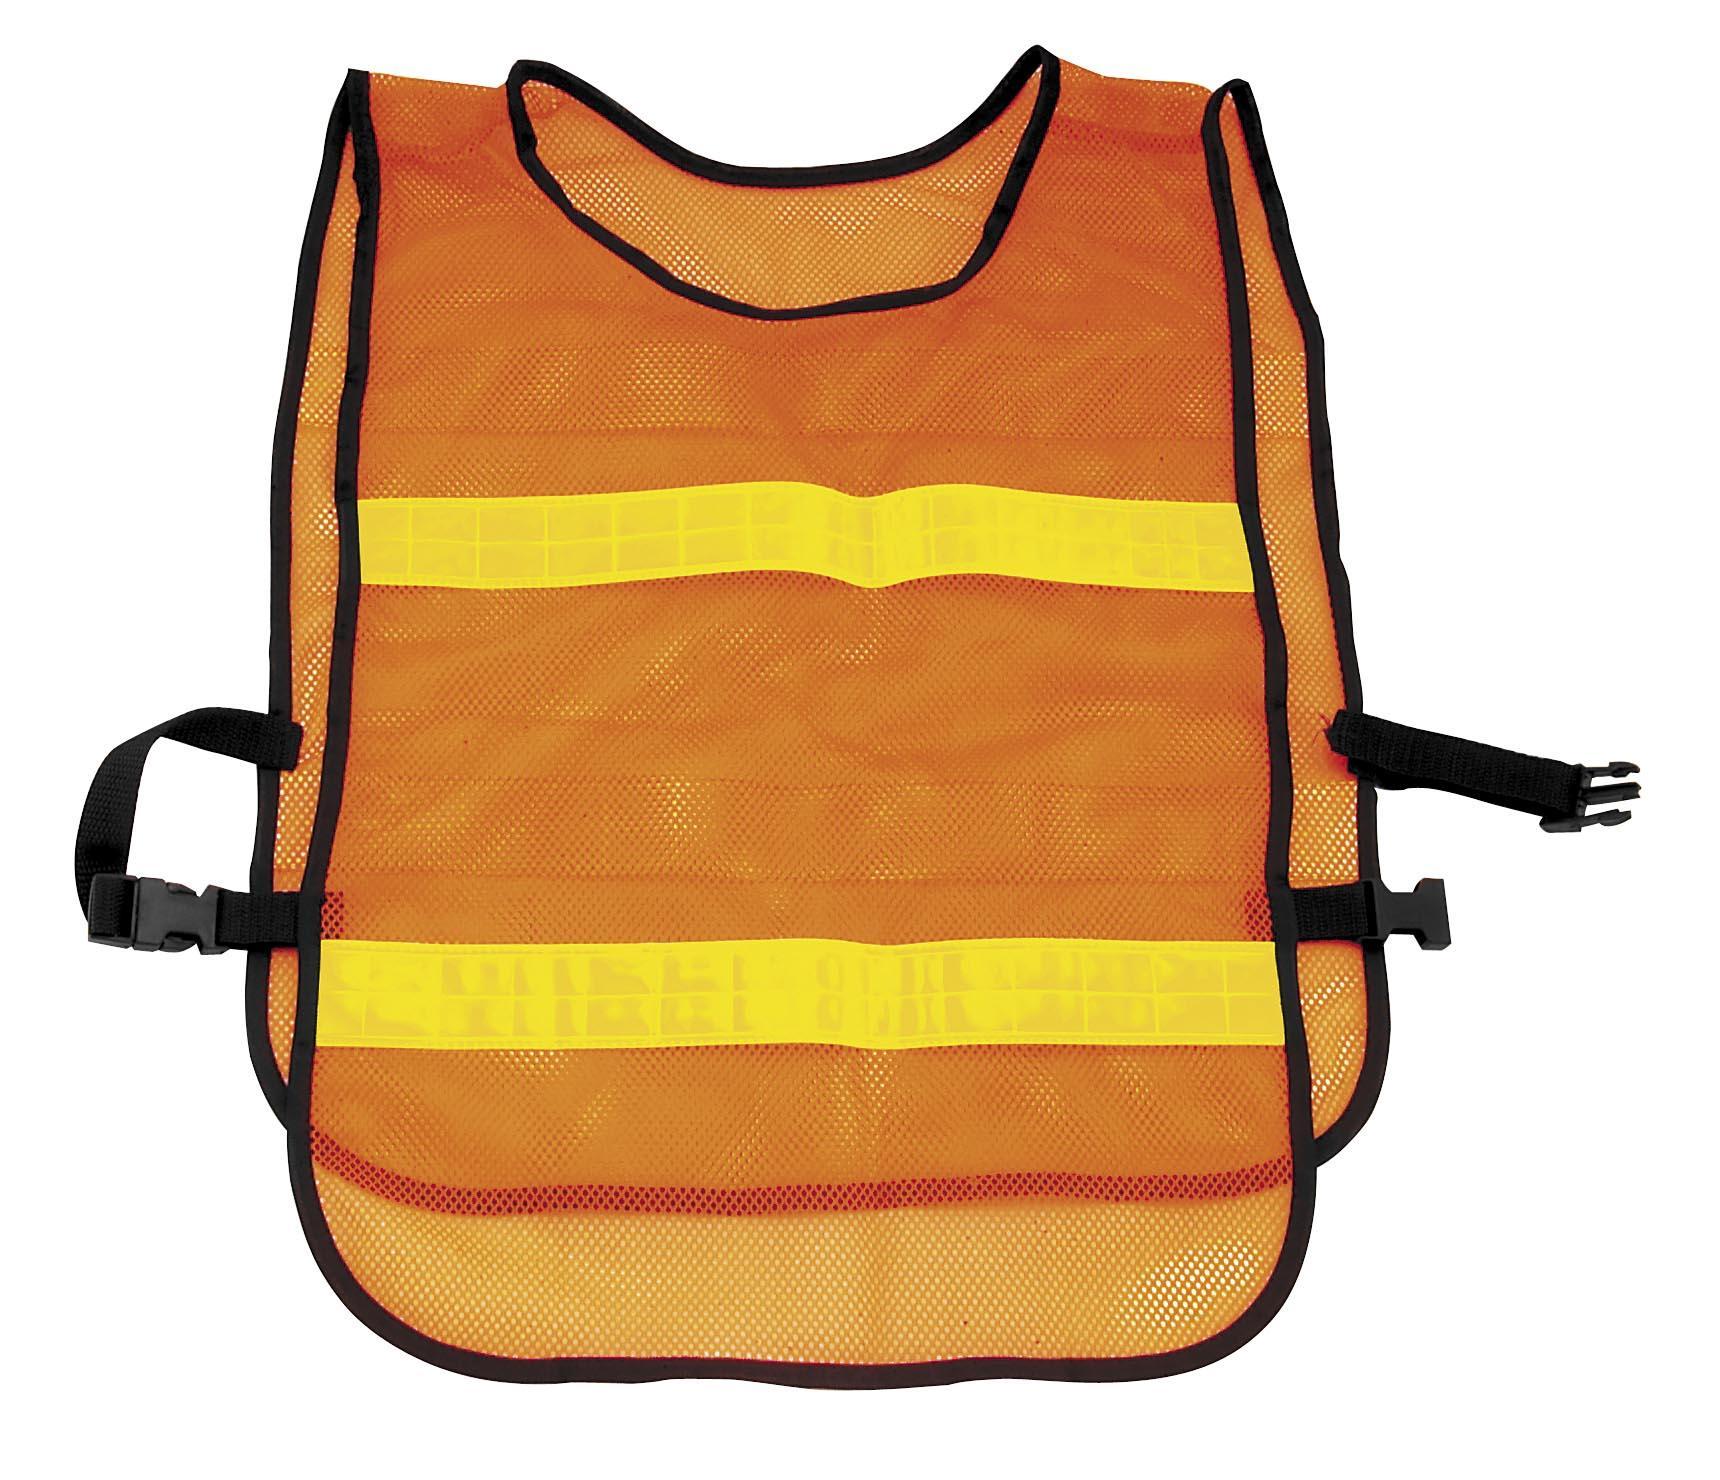 Reflector Safety Vest